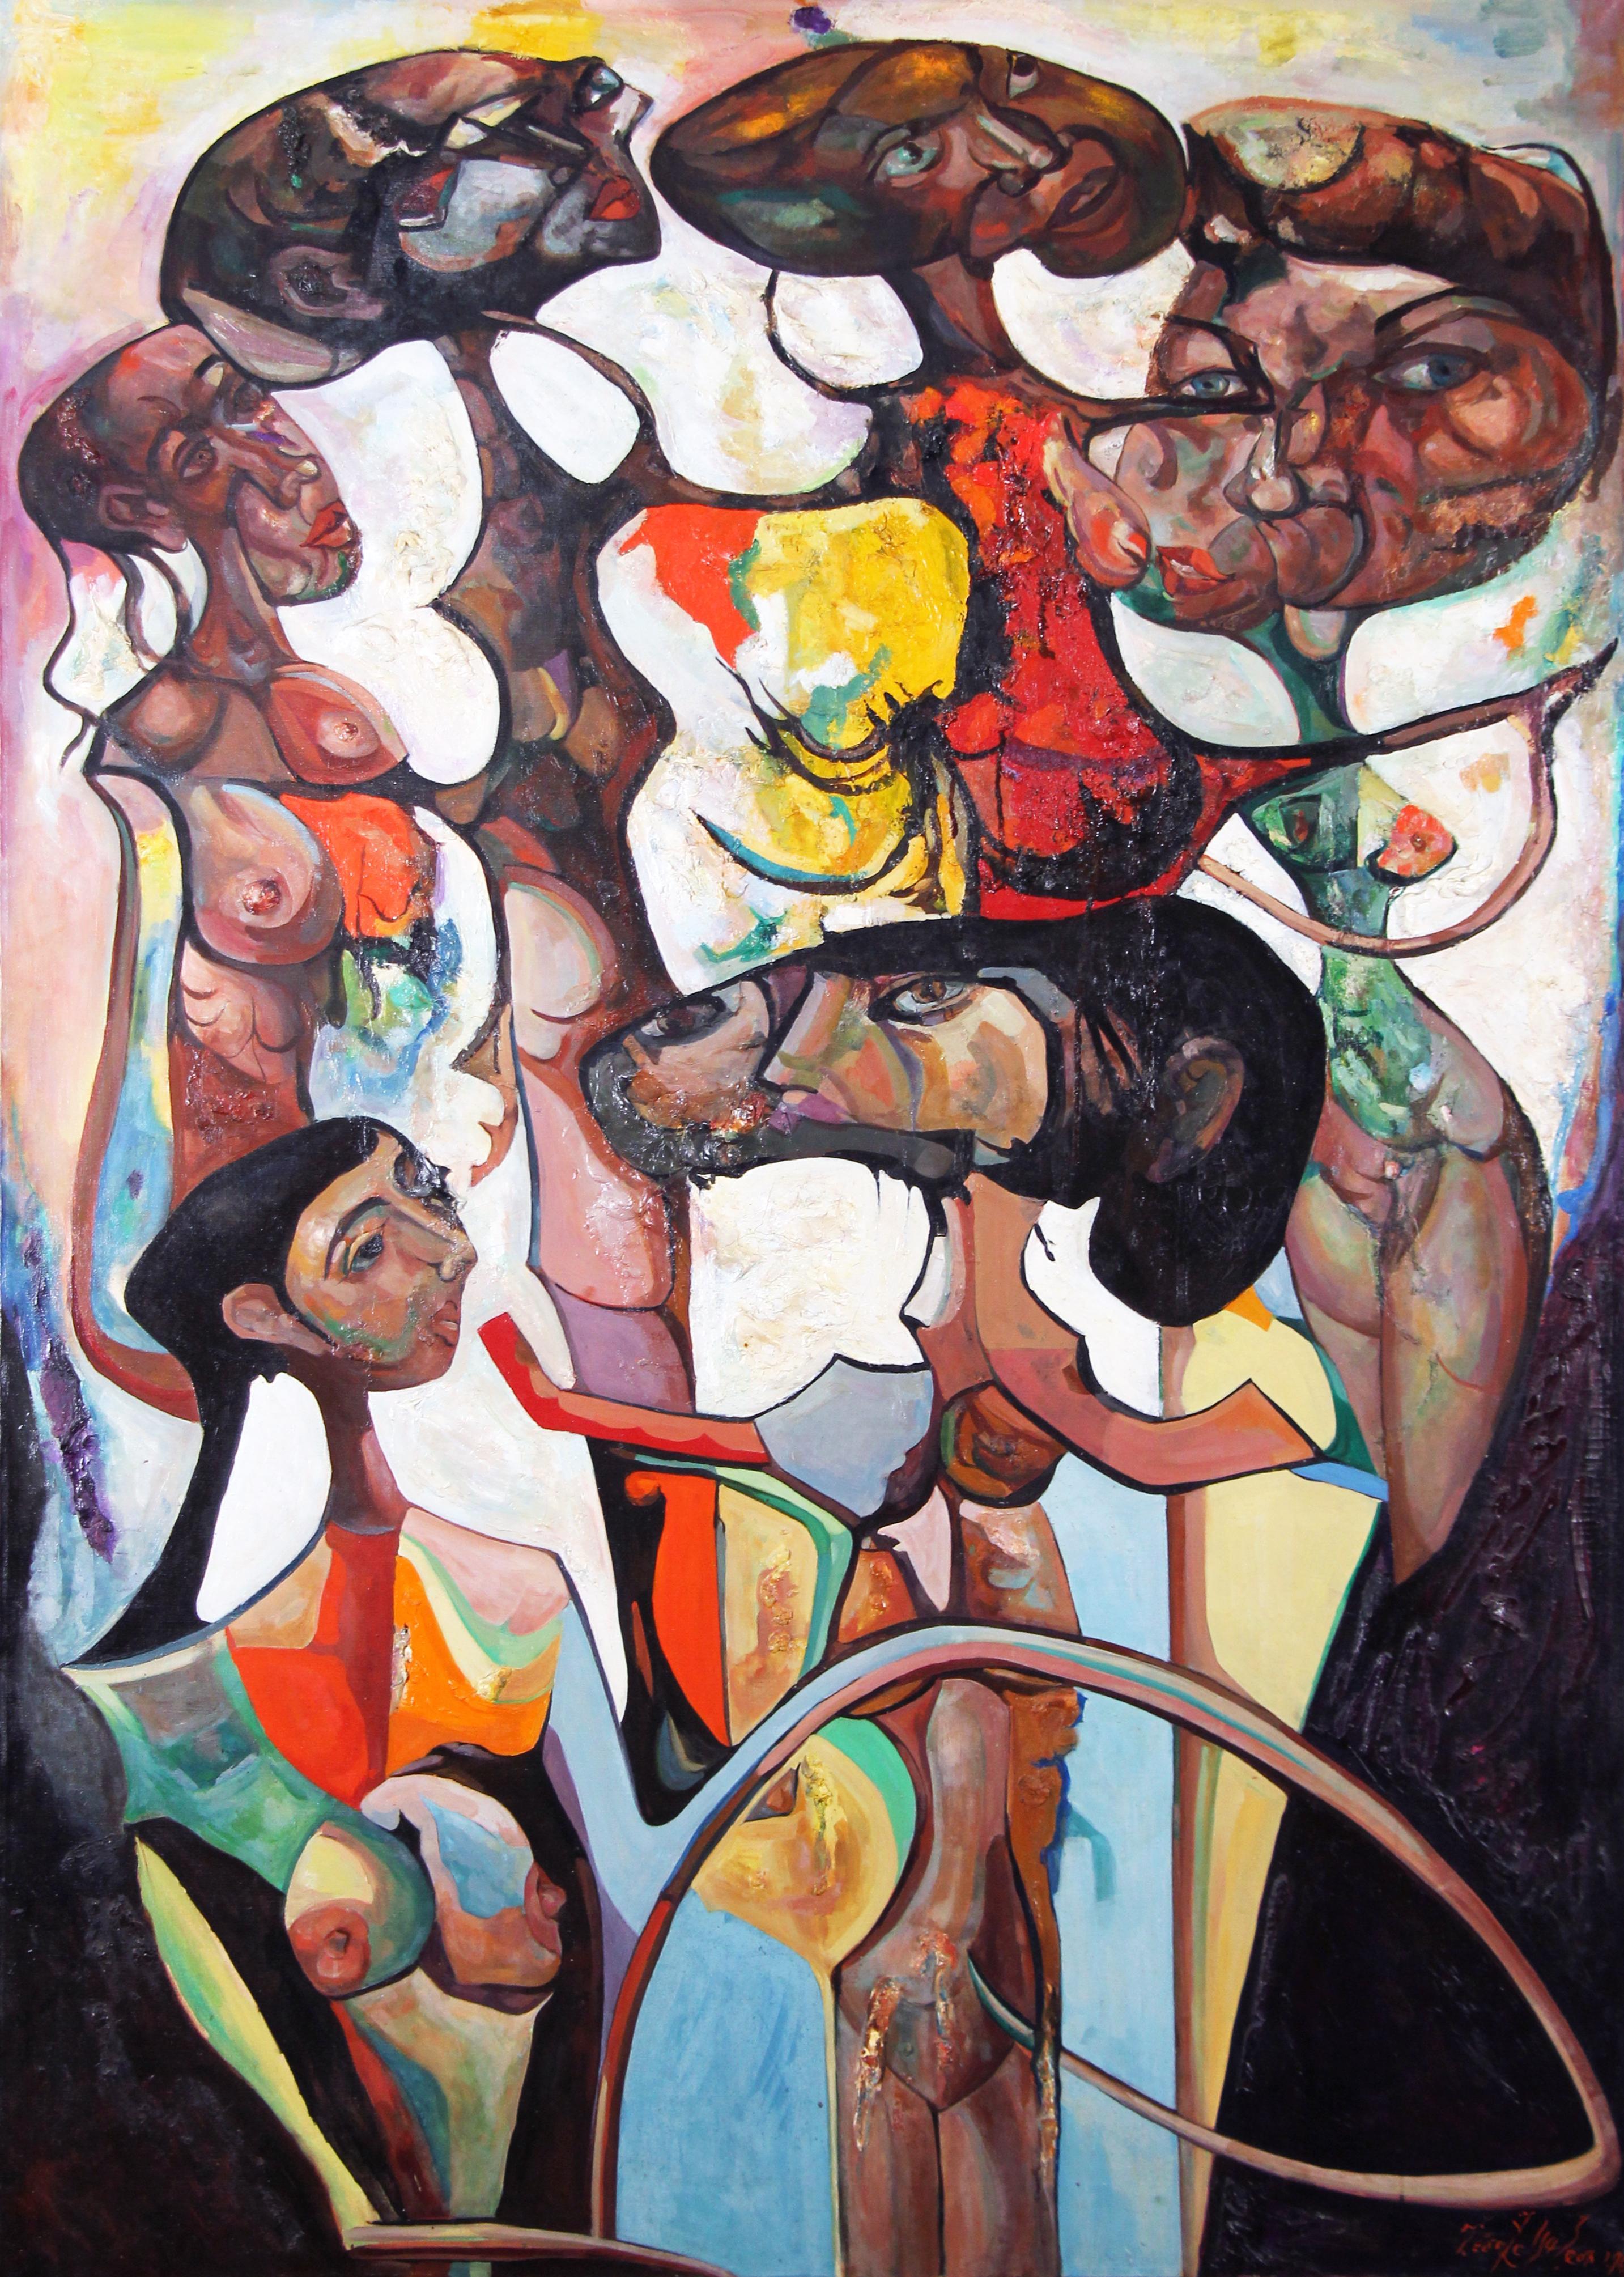 Secundo Congreso Feminino, Large Canvas Surrealist Female Group Portrait, 1969